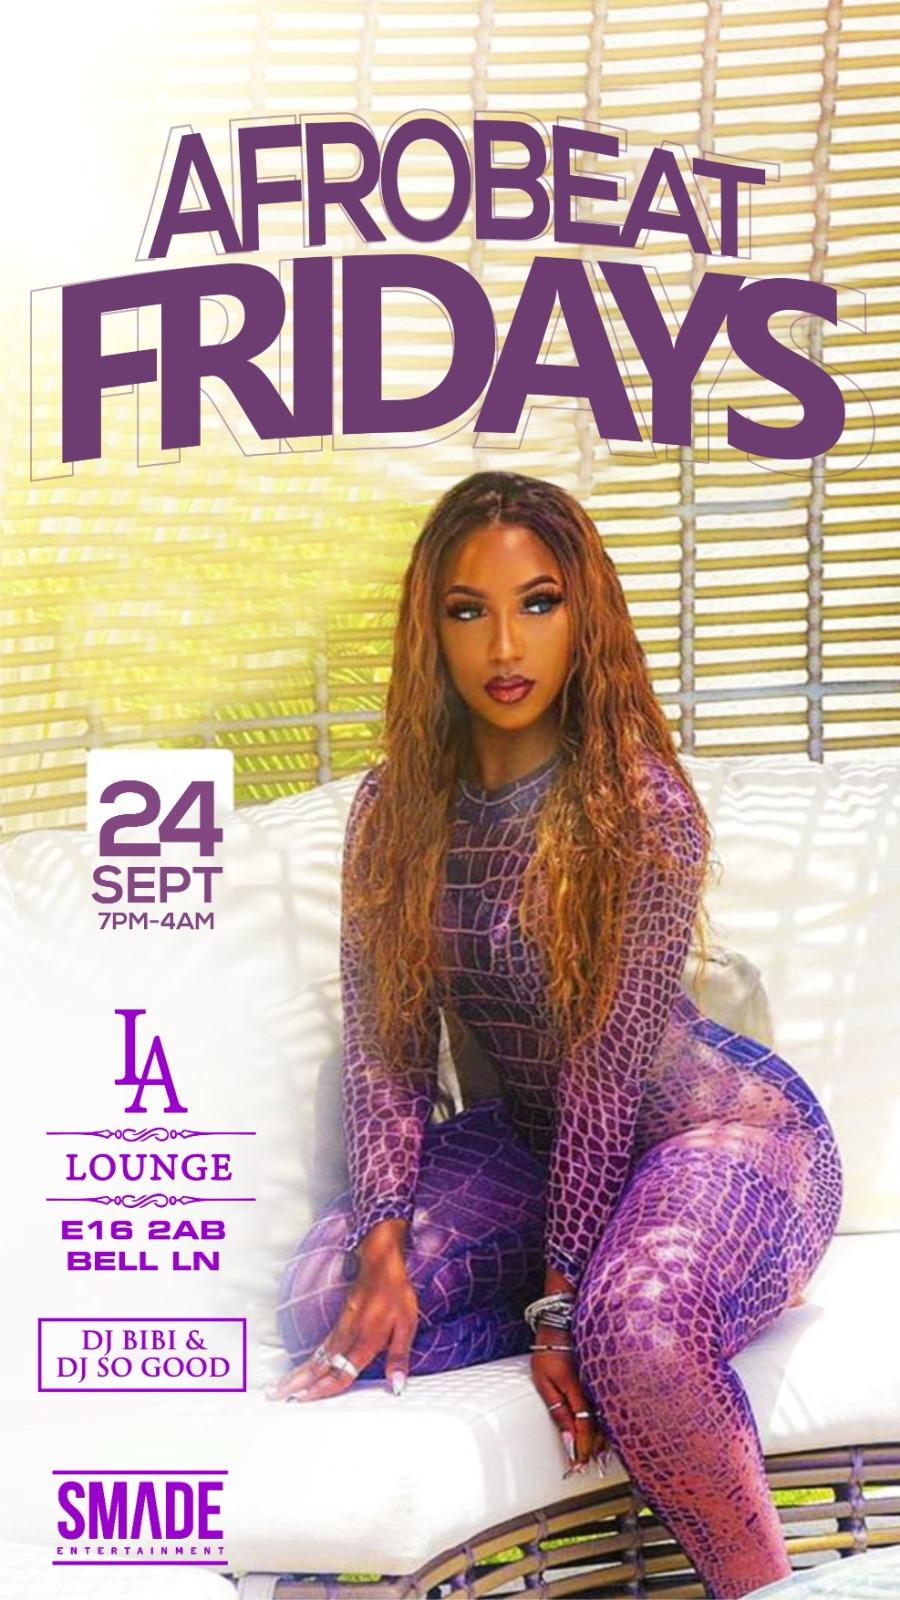 AfroBeat Fridays SEP 24